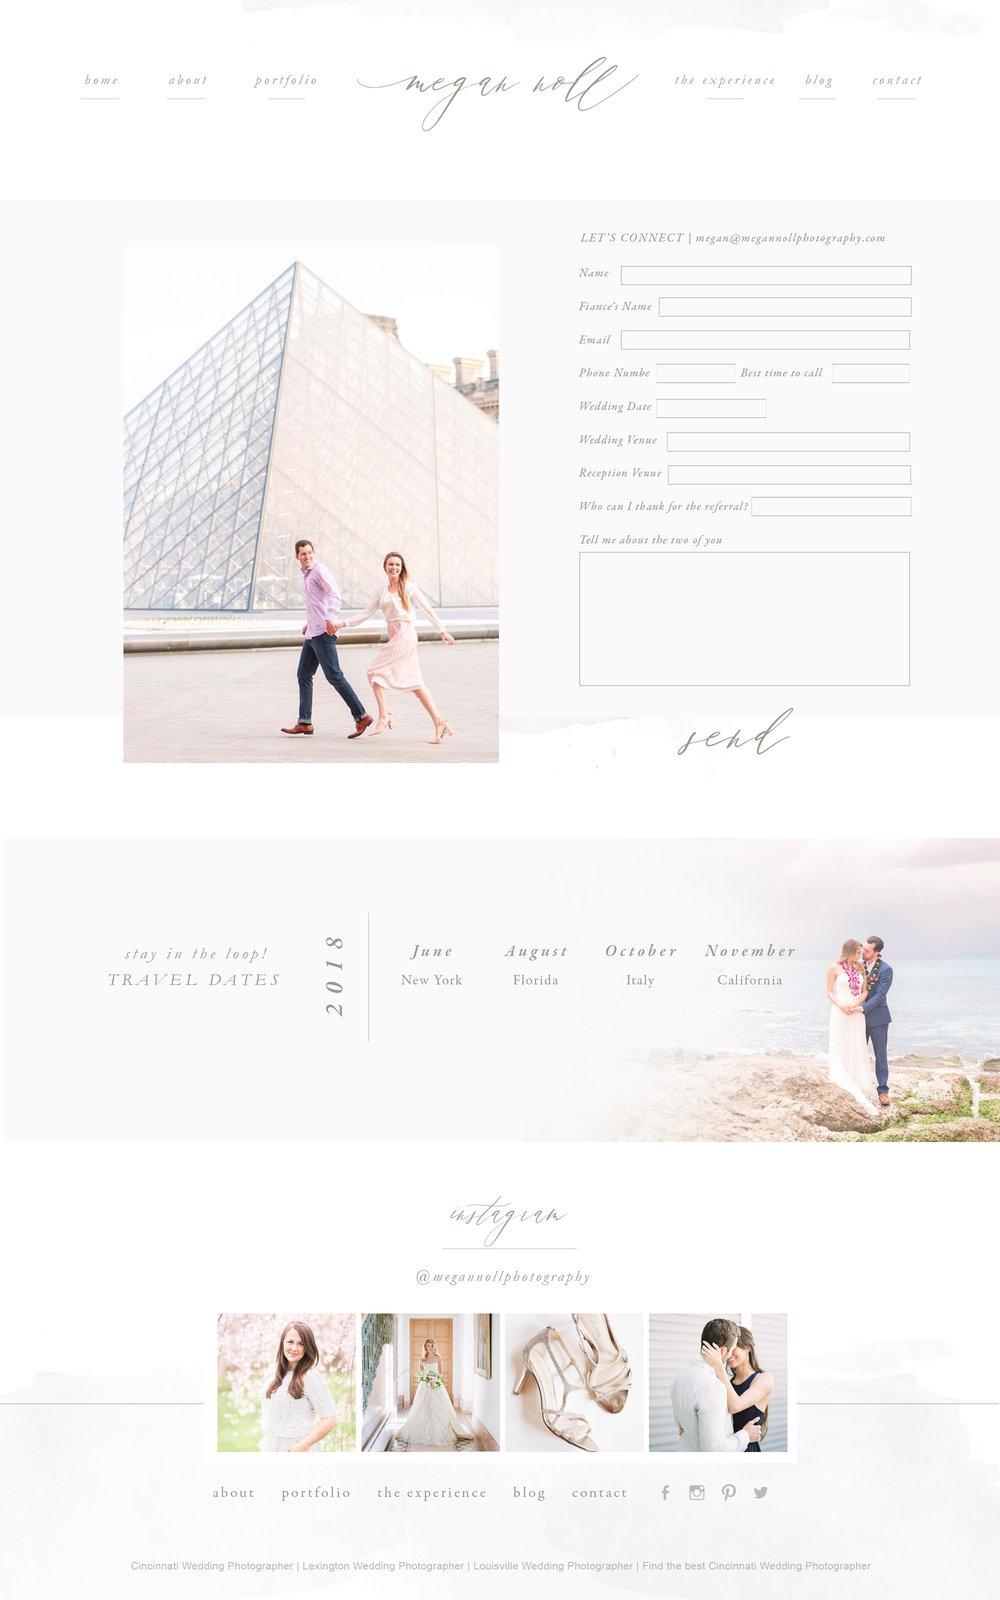 MeganNollPhotography_ShowitSite_LeslieVegaDesign3.jpg